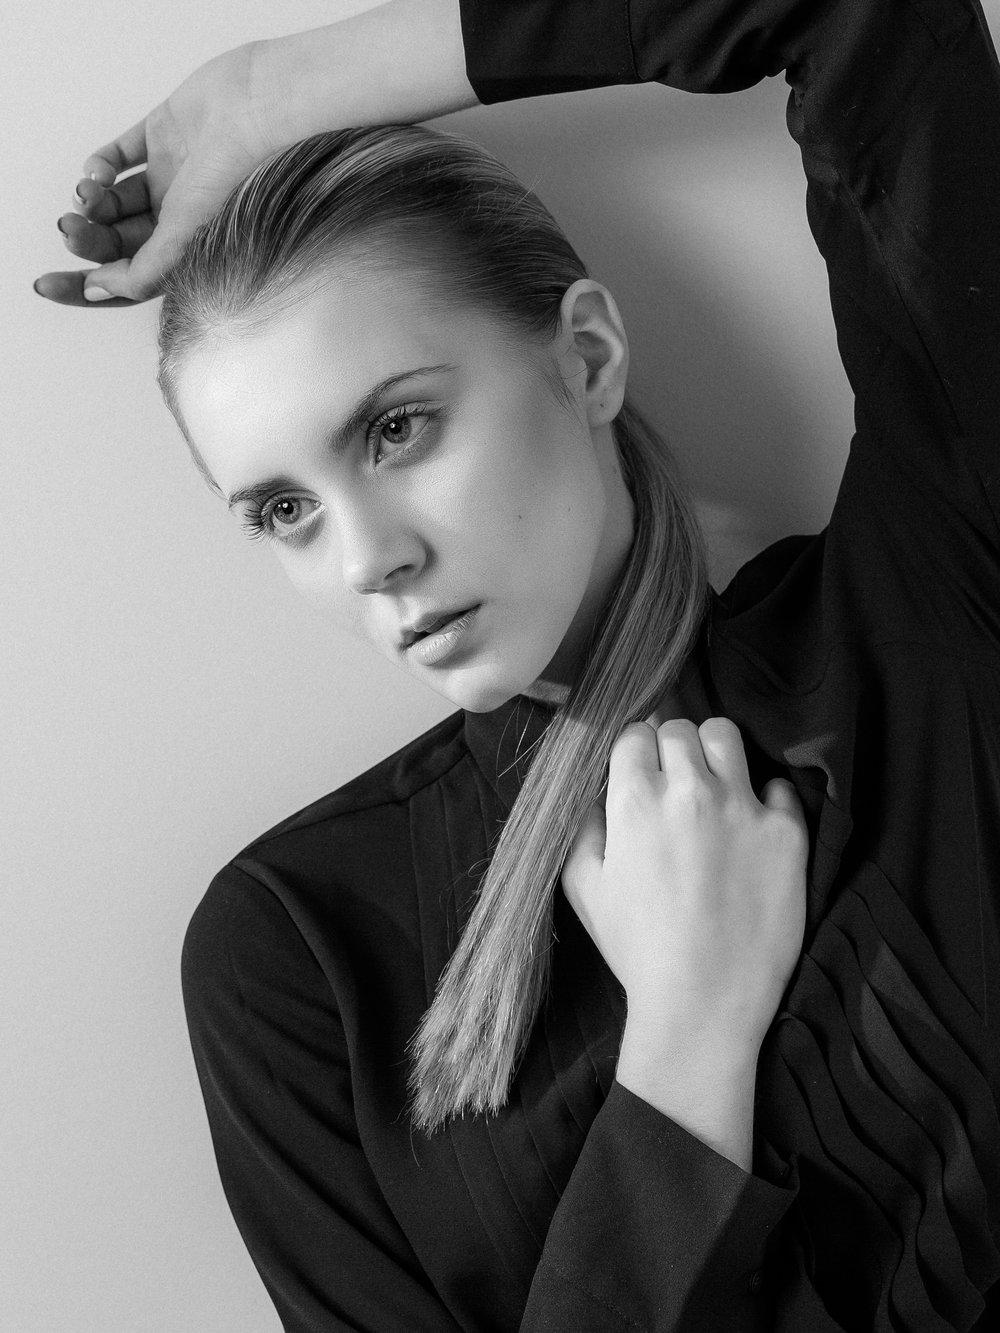 Polina-336-Edit.jpg